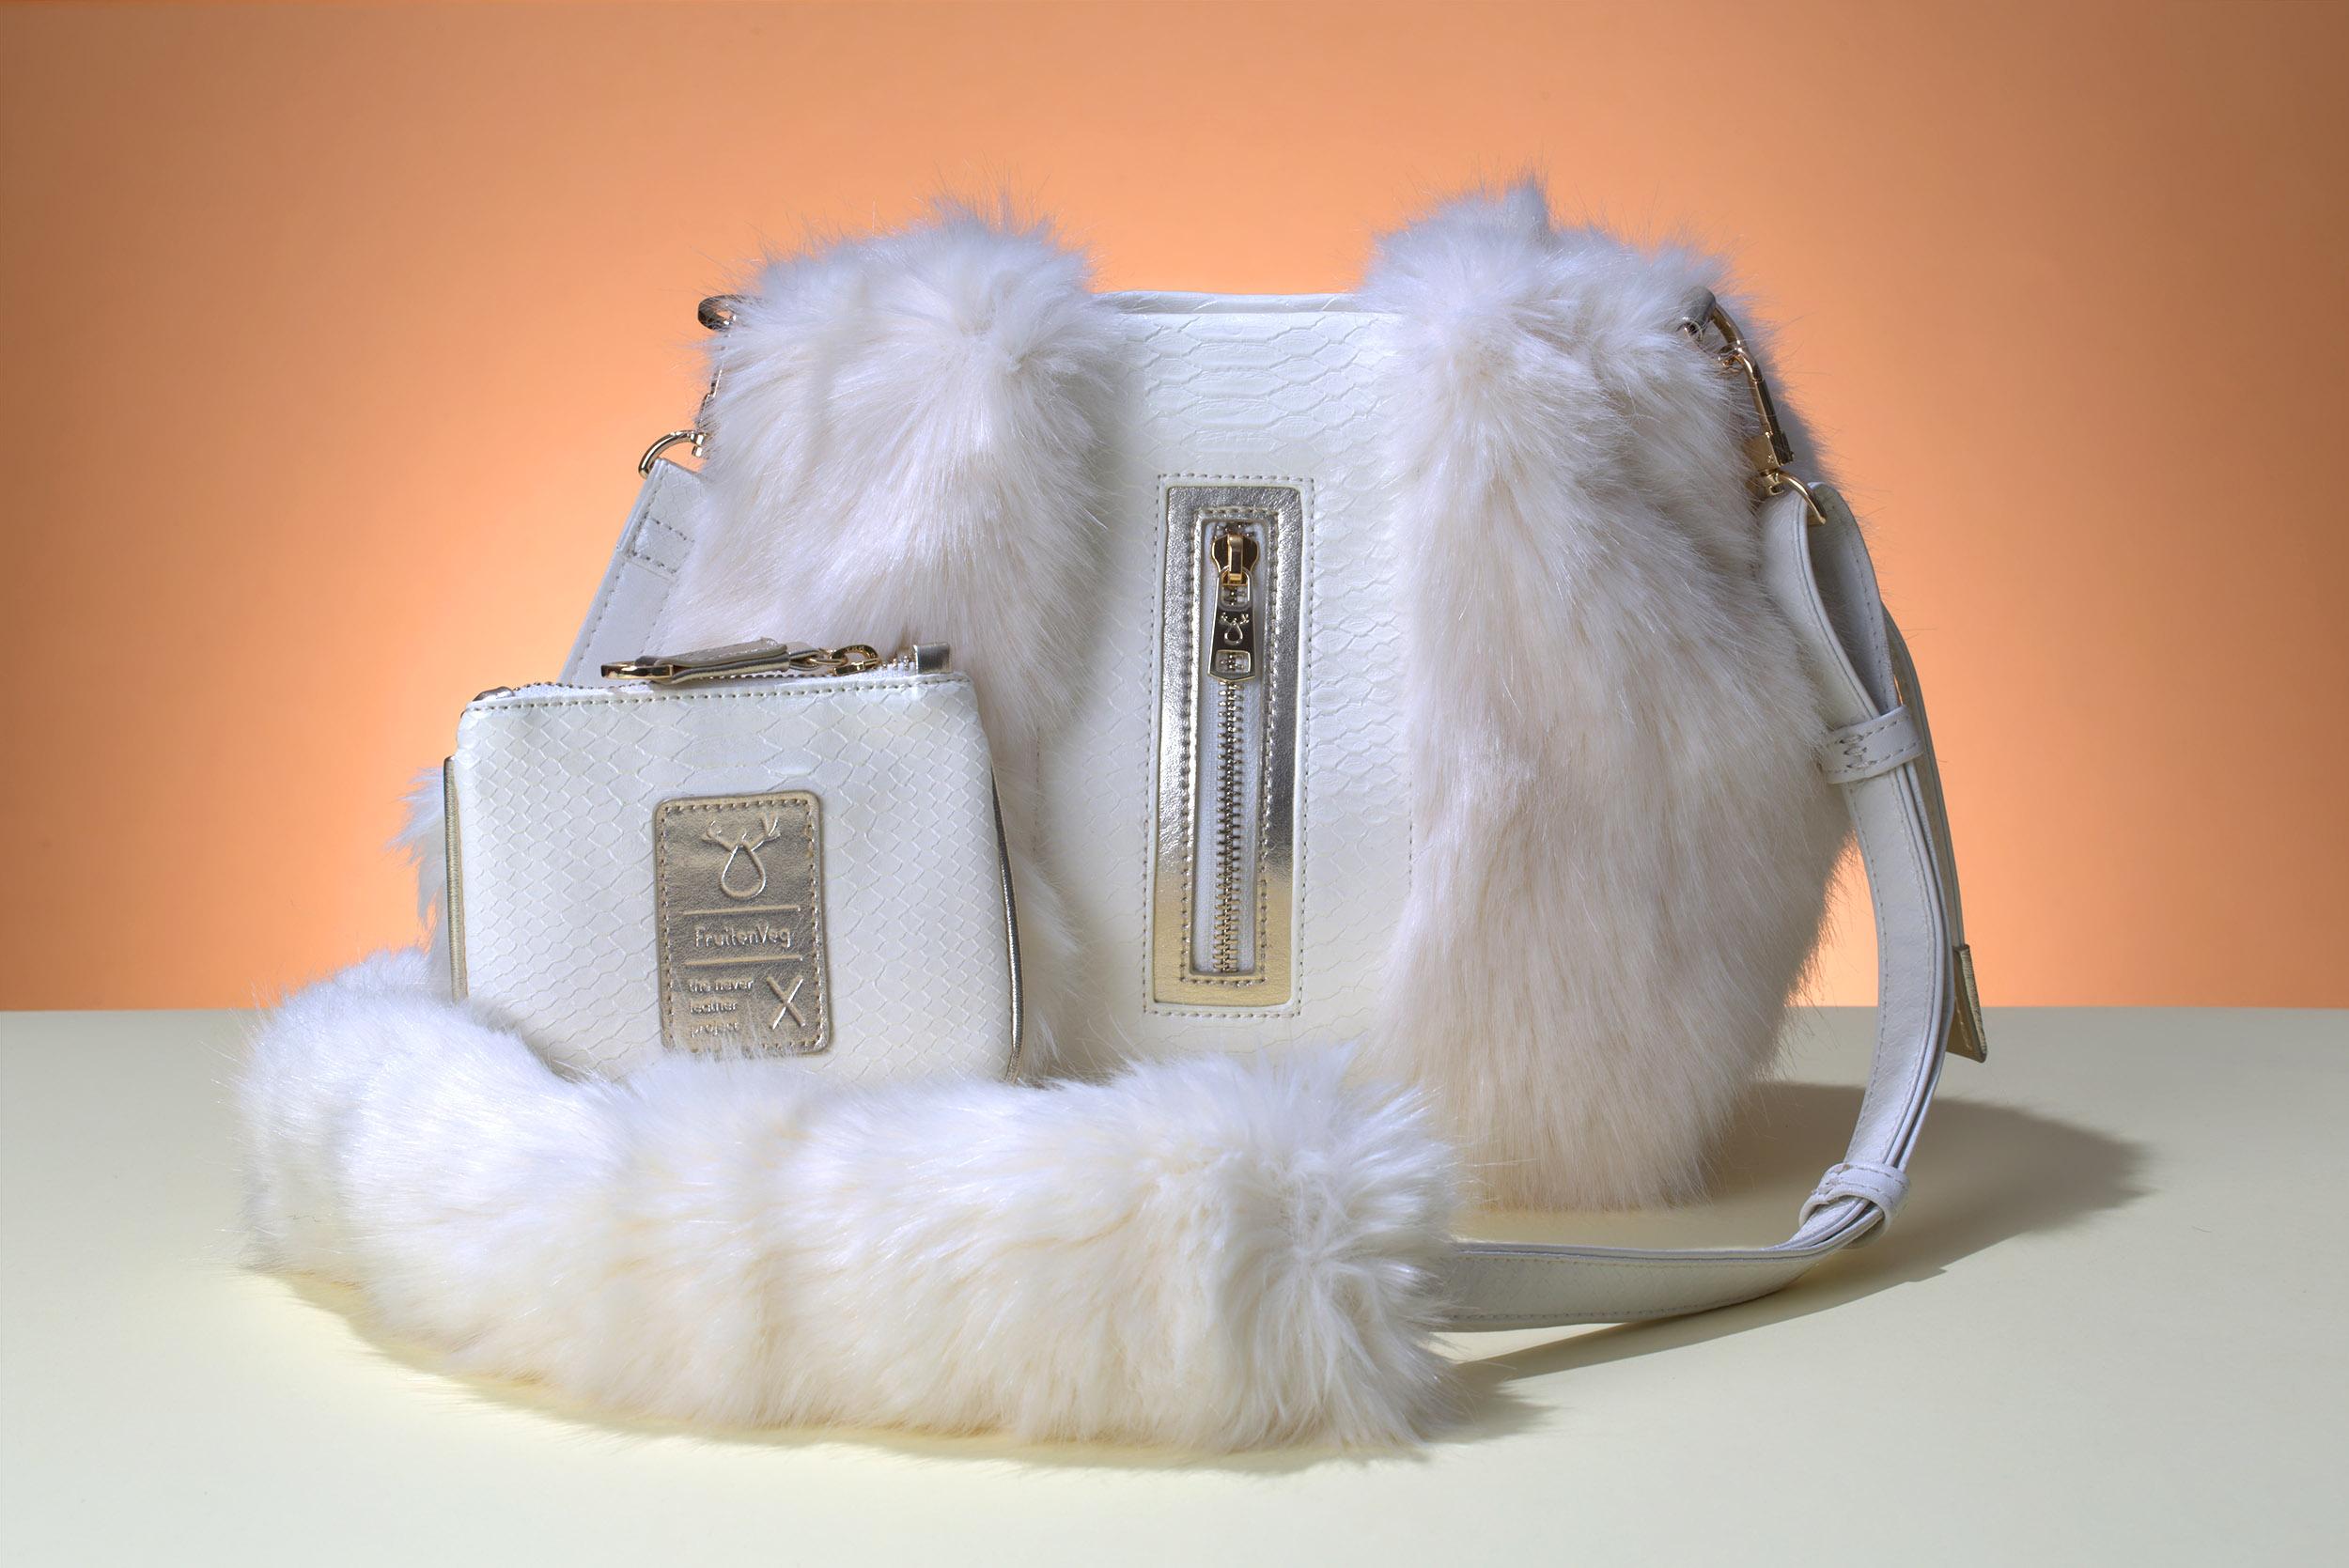 FruitenVeg-NAMI bag-never-fur-eco-leather-fake-artificial-fur-high-end-white-rhinestones-small-cross-body-handbag-nyc